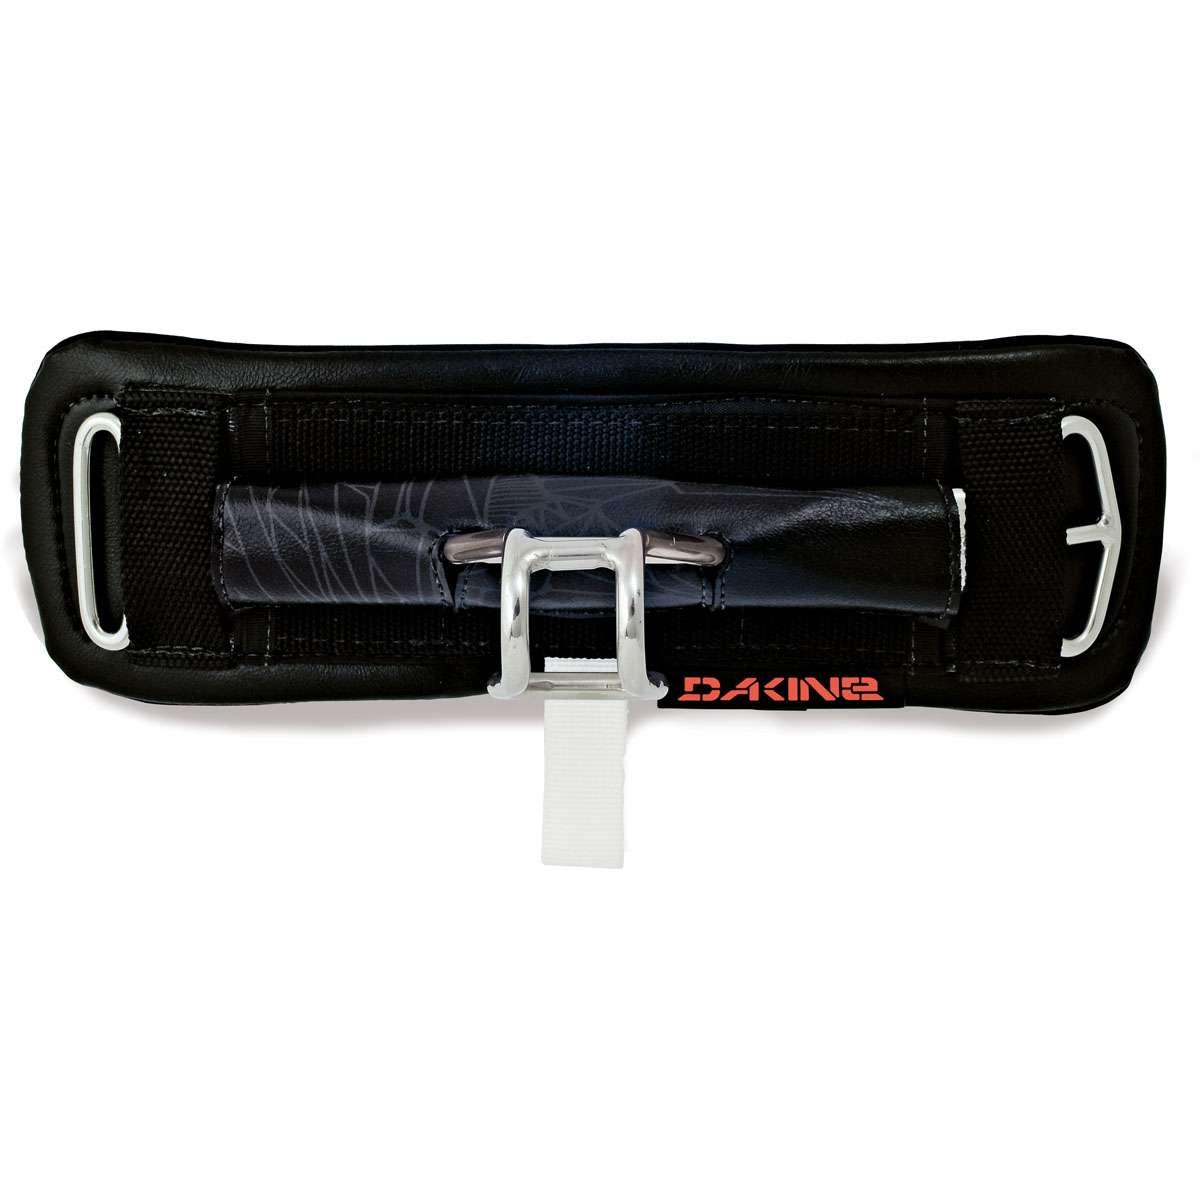 Dakine Push Button Hammerhead Spreader Bar Assorted 12